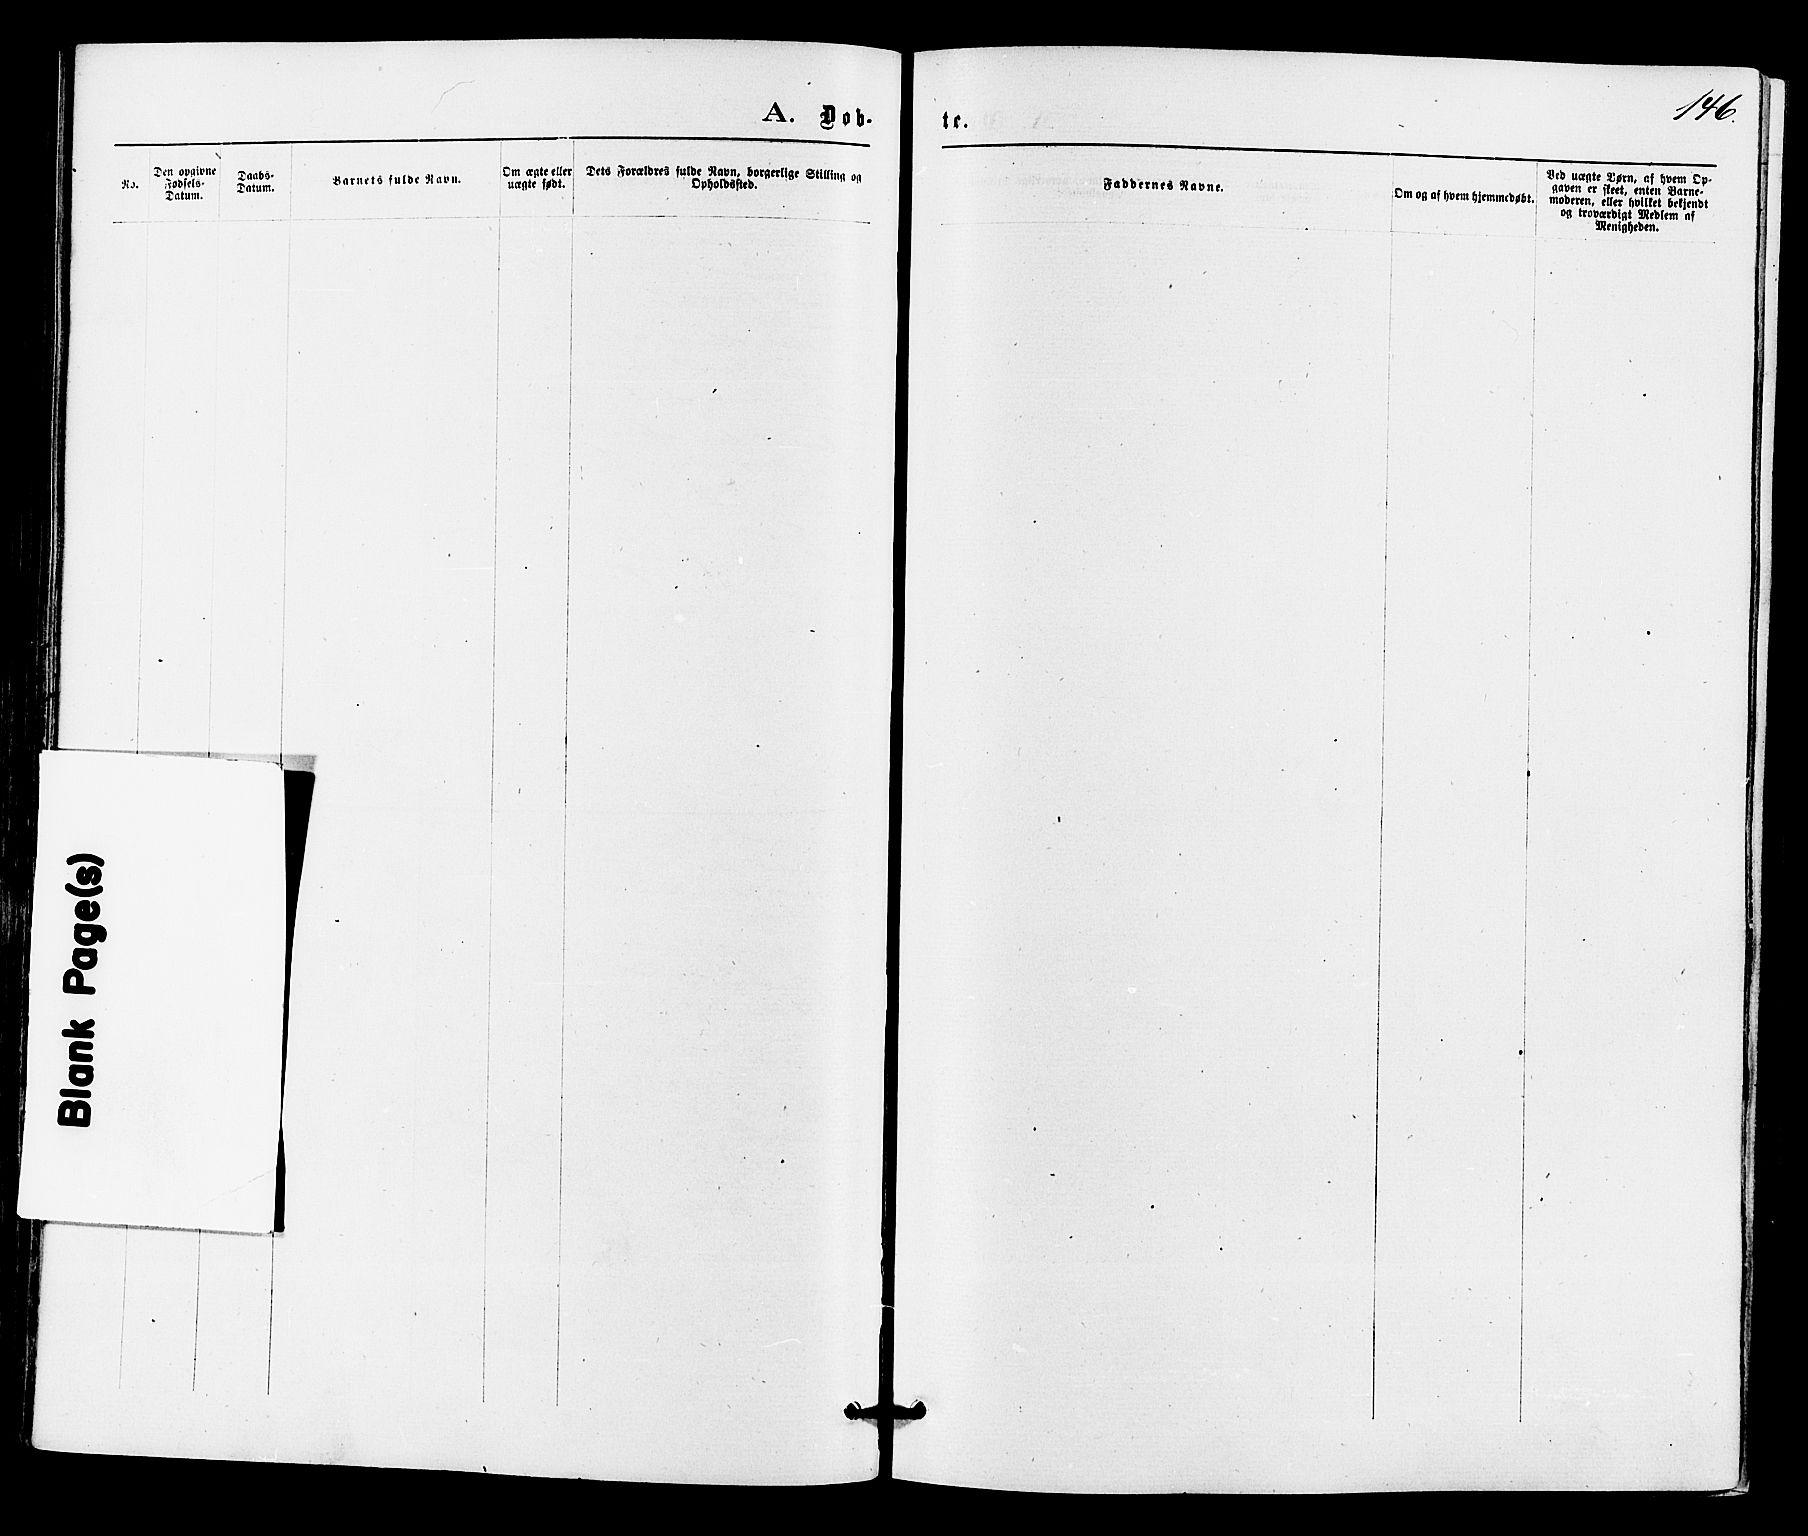 SAKO, Drangedal kirkebøker, F/Fa/L0009: Ministerialbok nr. 9 /1, 1872-1884, s. 146